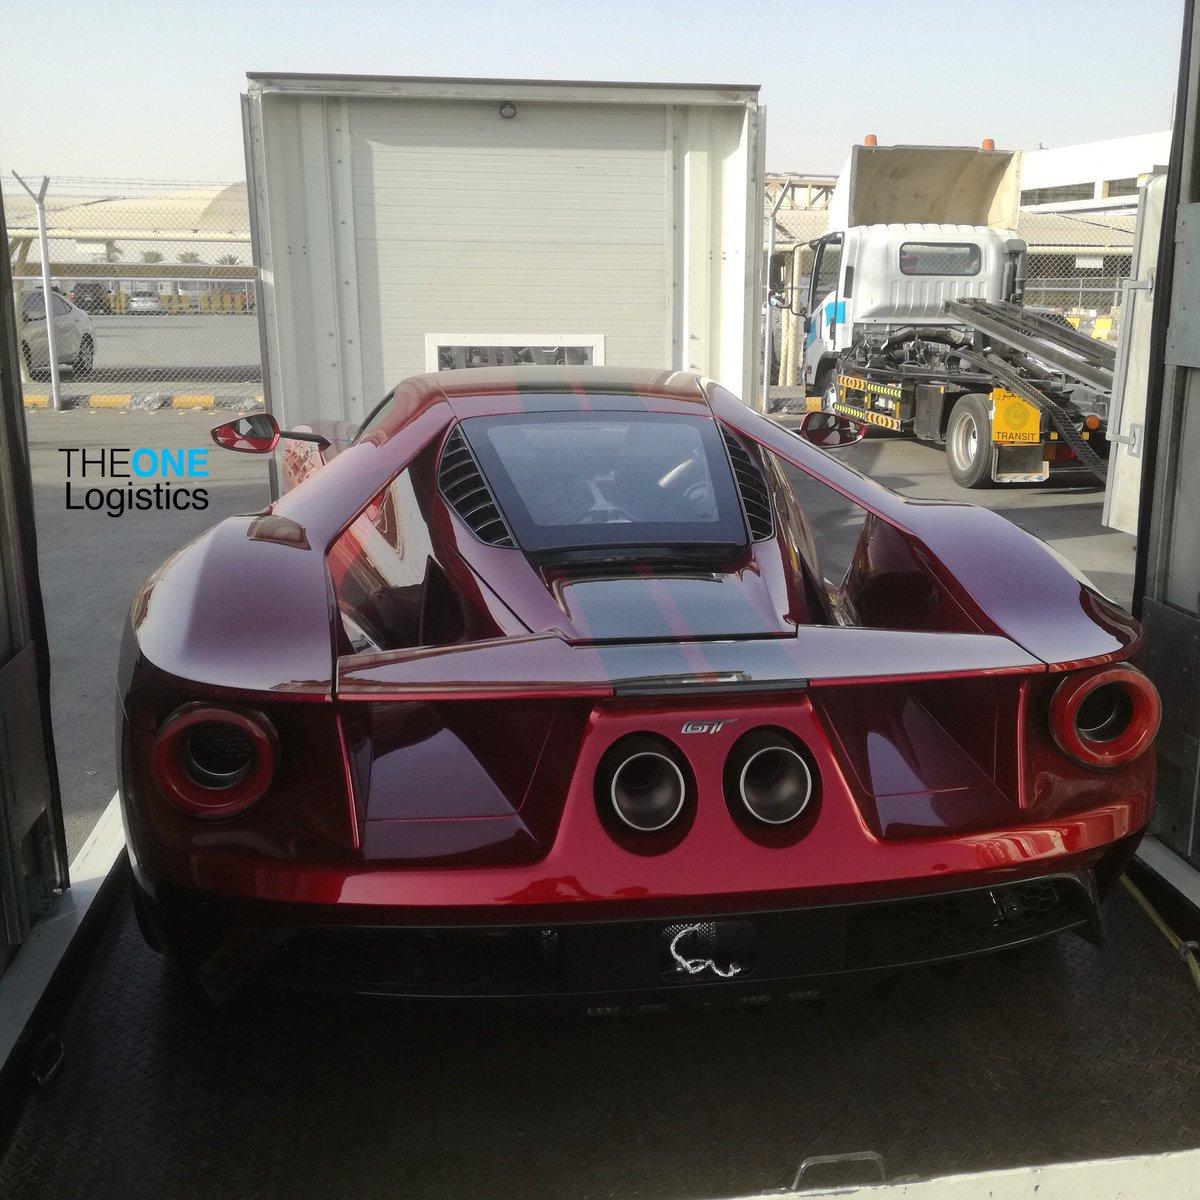 Thelogistics Logistics Saudi Qatar Ksa Cars Exotic Spotted Saudi_cars Dammam Ford Fordgt Fordgt Gt Gt Americanmusclepic Twitter Com